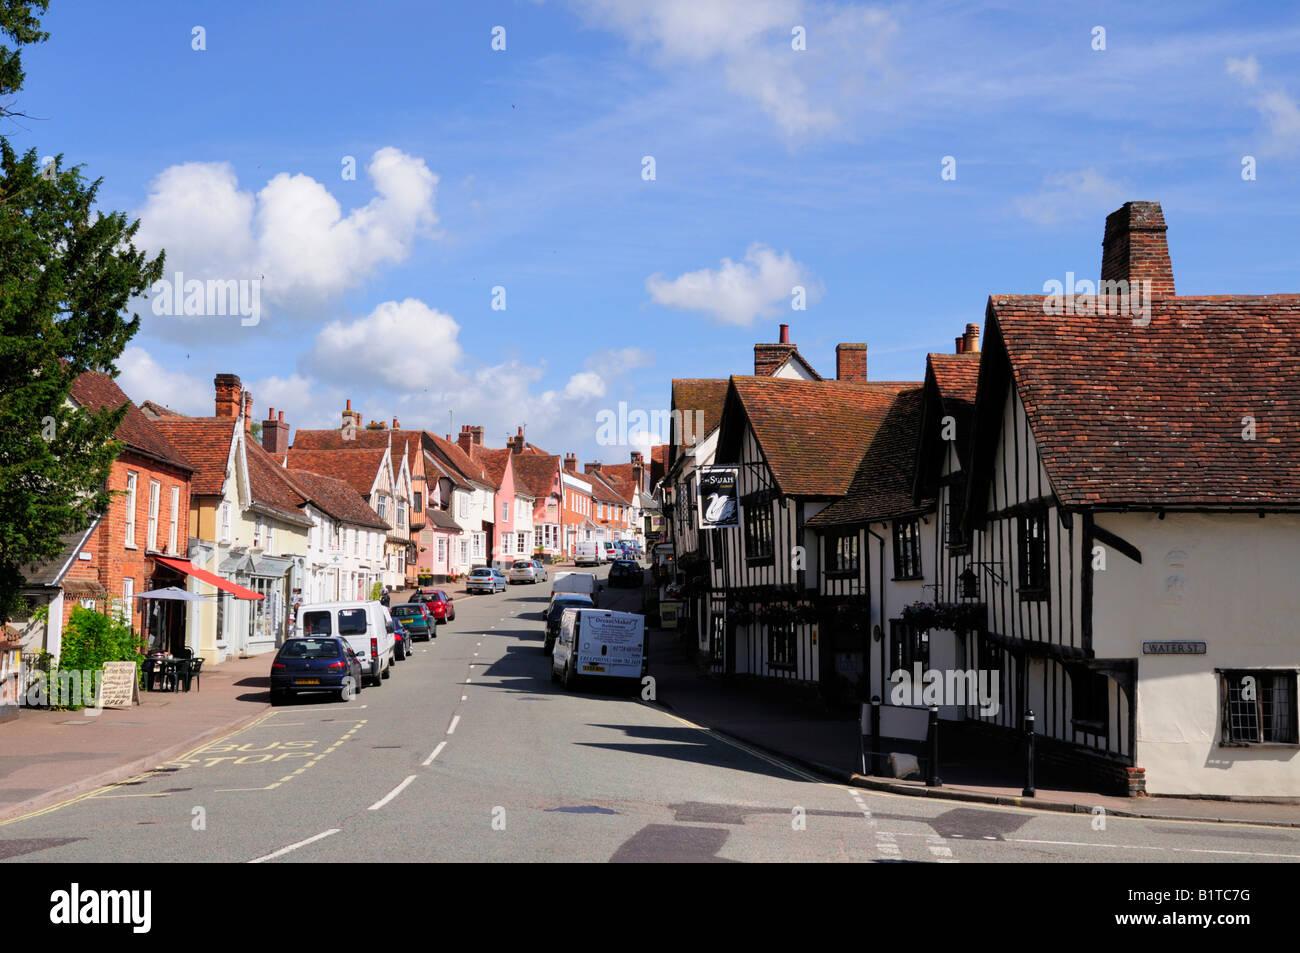 Lavenham, Suffolk, England, UK - Stock Image